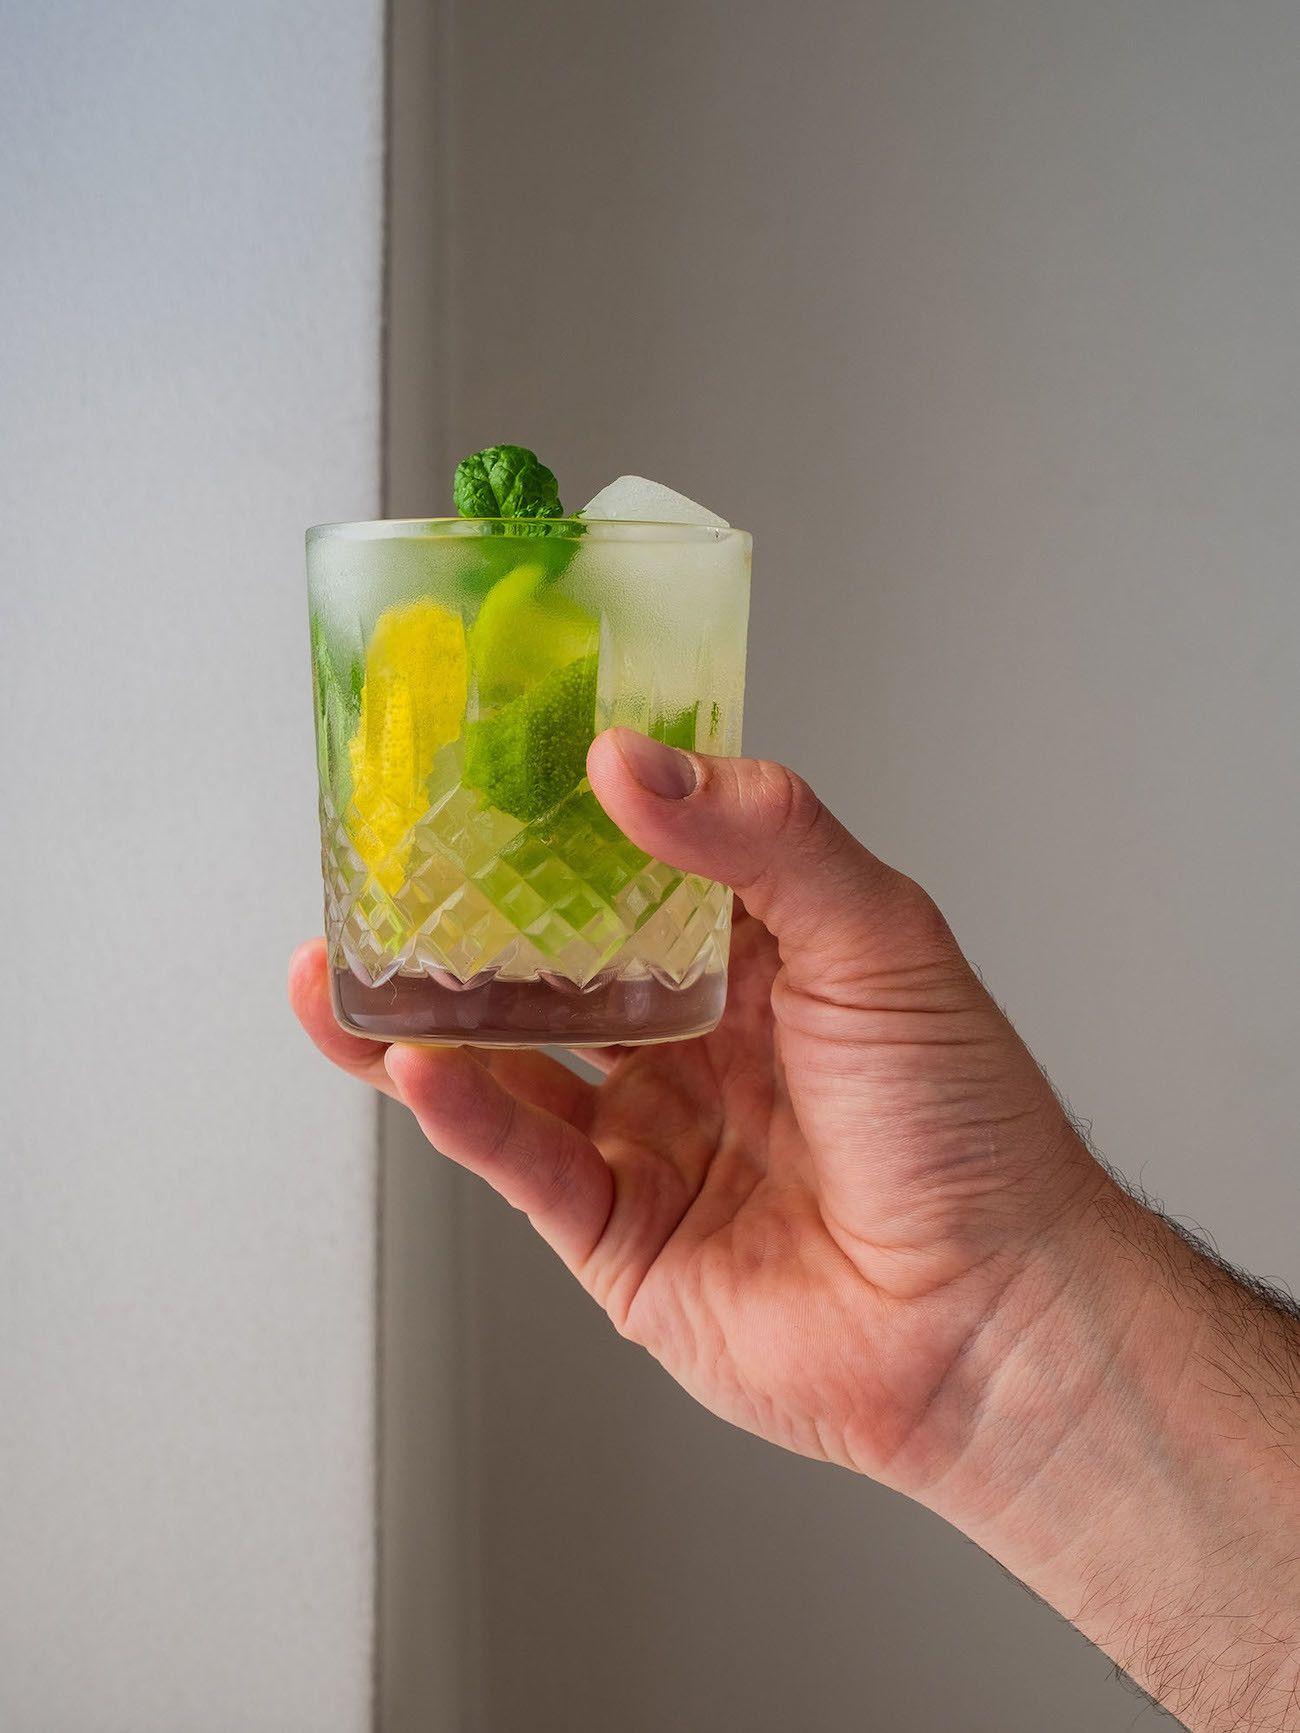 Foodblog About Fuel, Rezept Power Hugo, Saint Germain, Drink, Zitronenzeste